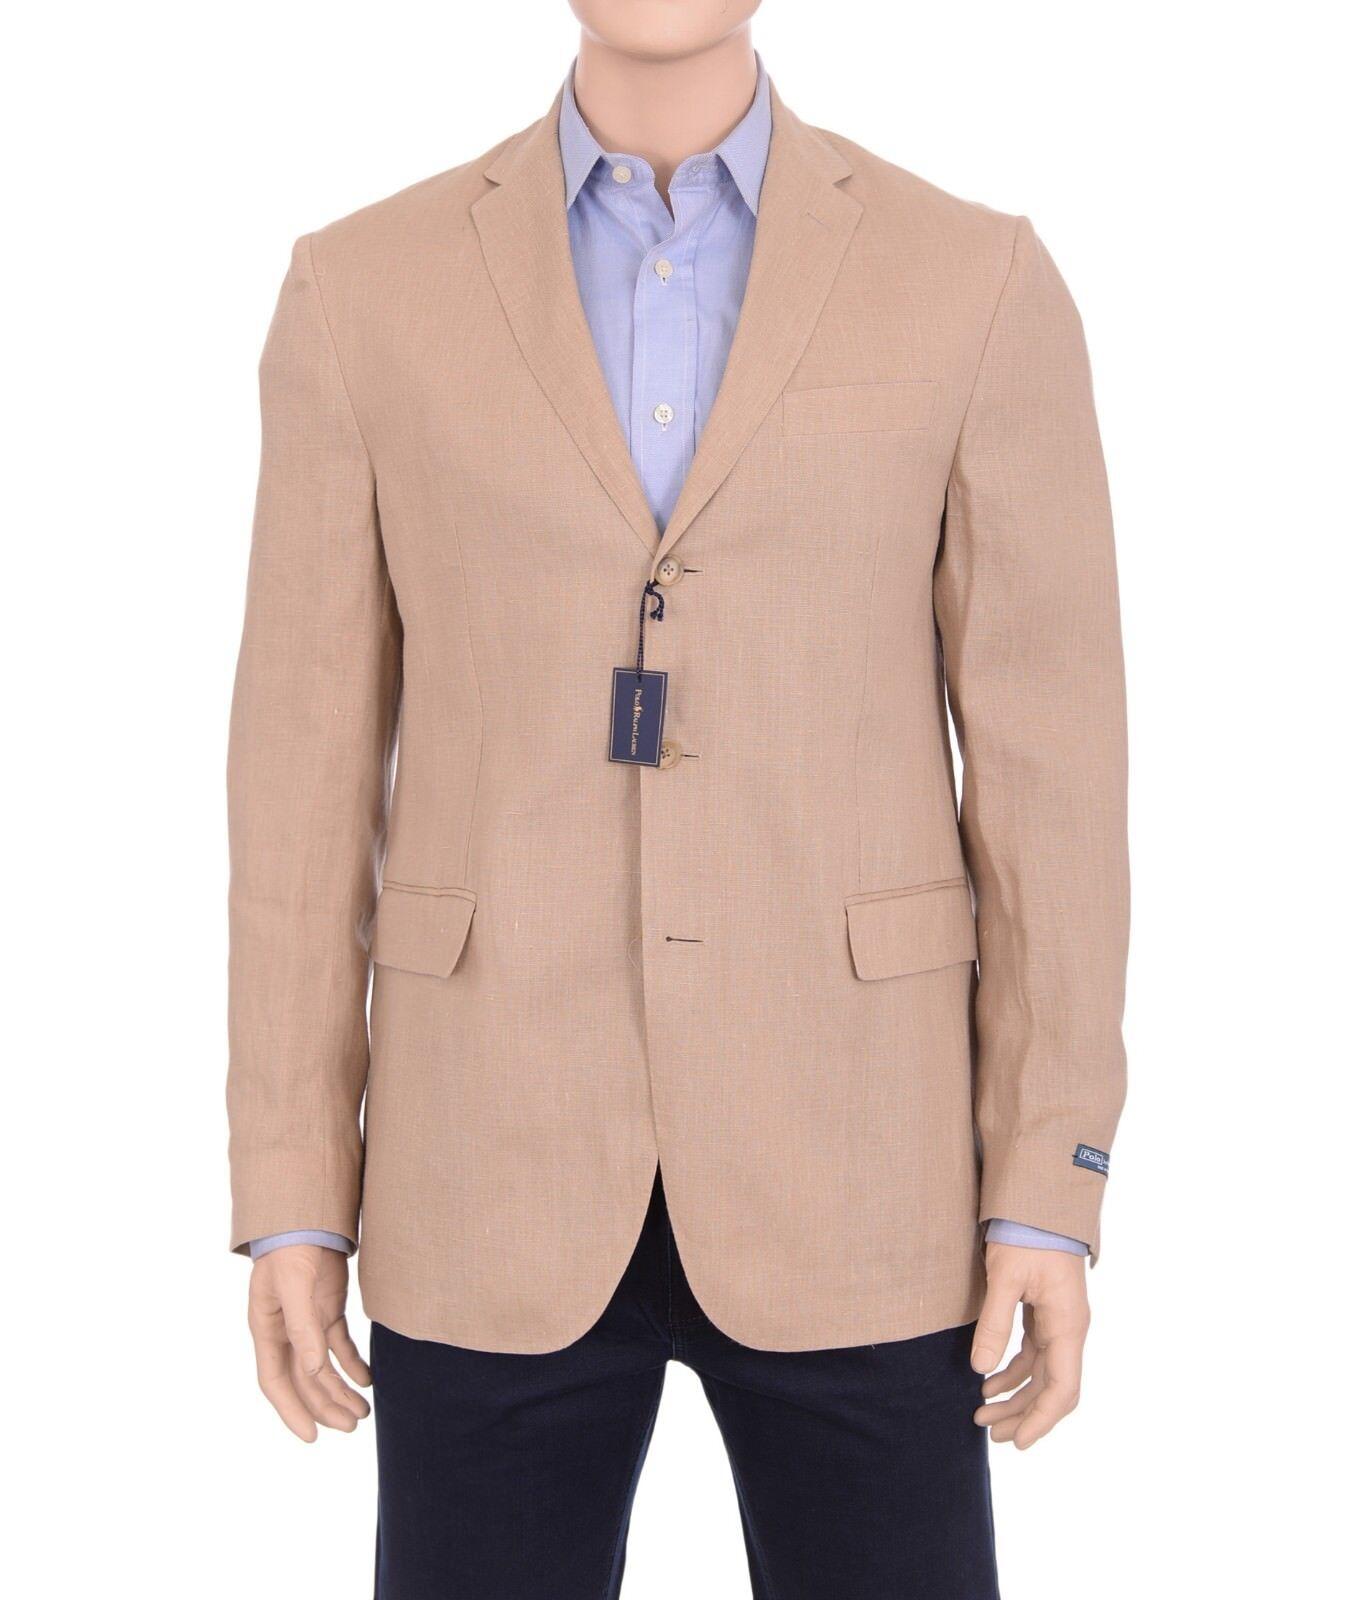 595 Polo By Ralph Lauren 42L  Herren Tan Beige Linen Gilford Blazer Sportcoat NWT